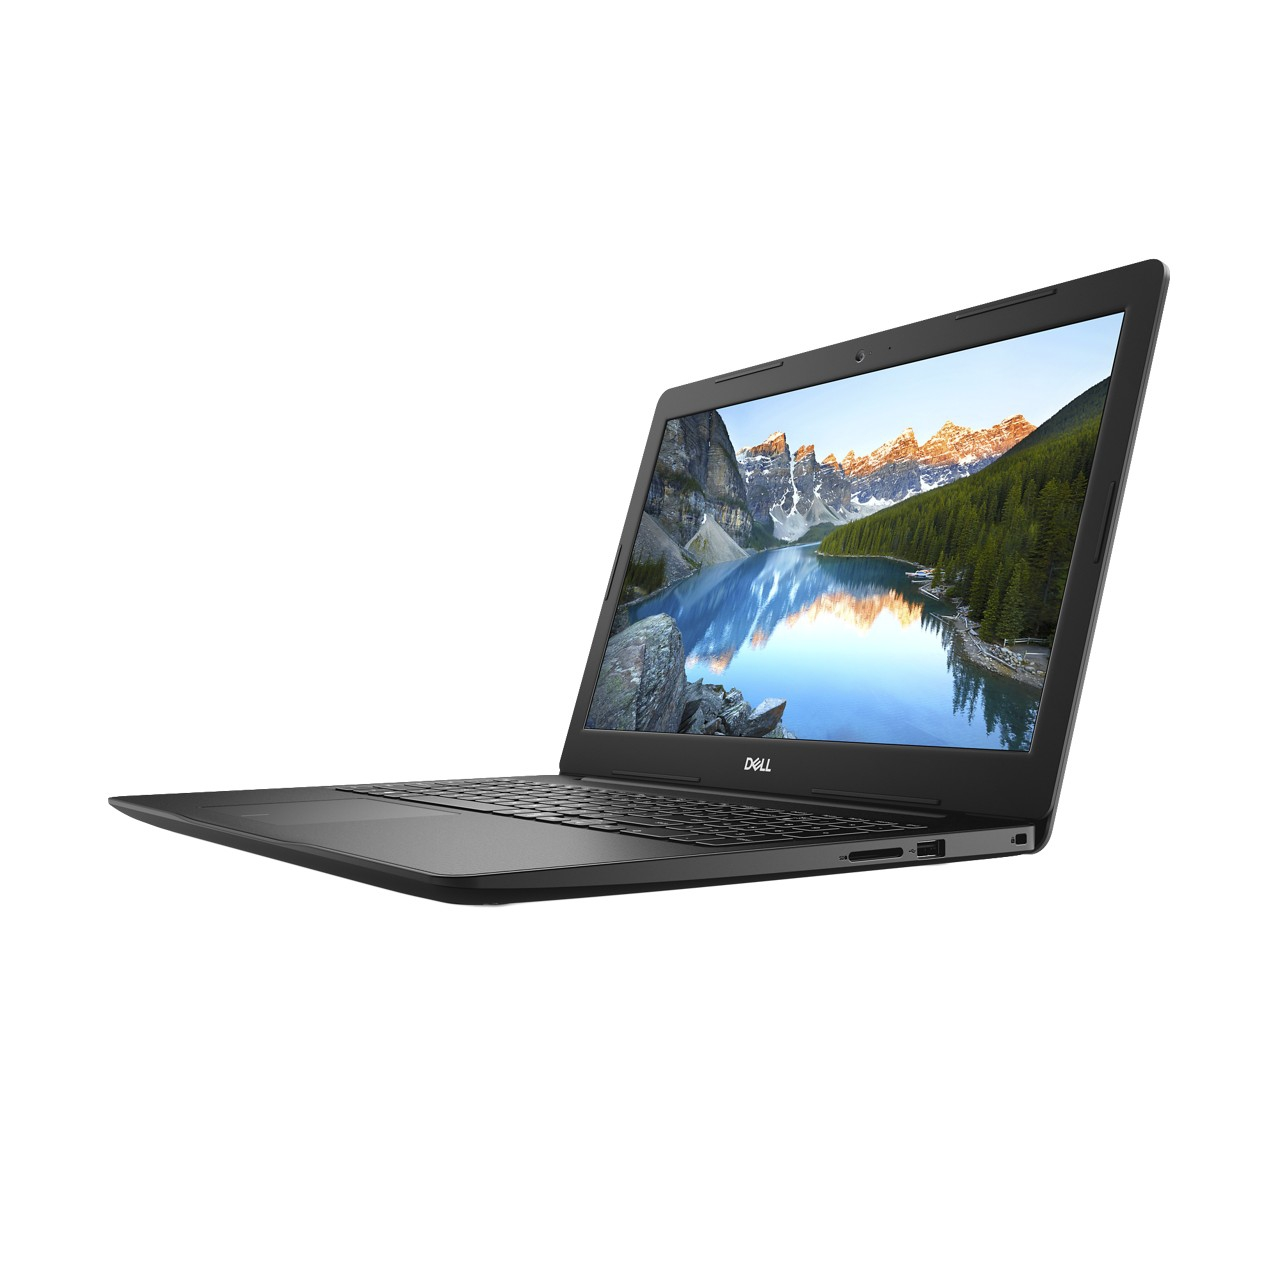 Notebook Dell Inspiron 3584 Core I3 7020u Memoria 4gb Hd 1tb Tela Led 15.6' Hd Sistema Windows 10 Home